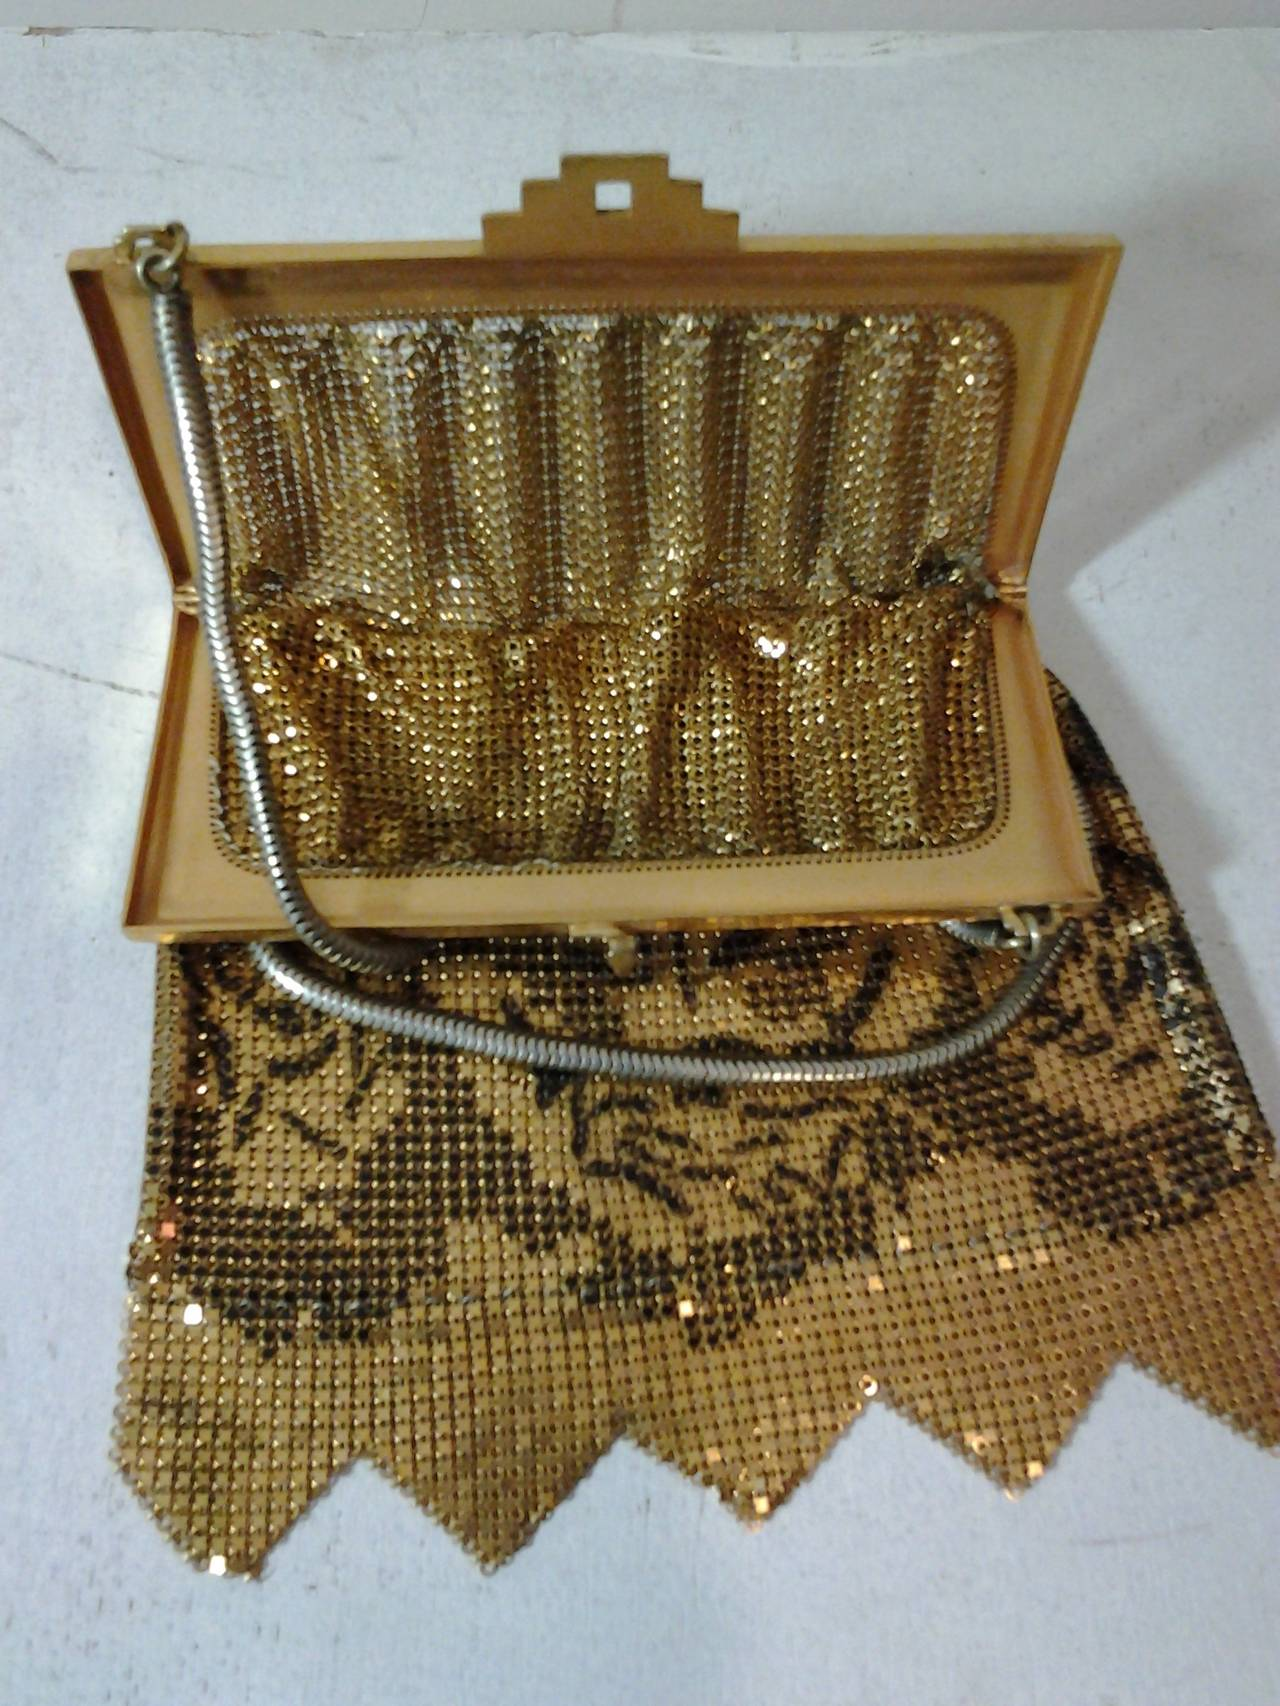 1920s Metal Mesh Evening Bag In Gold And Black Enamel At